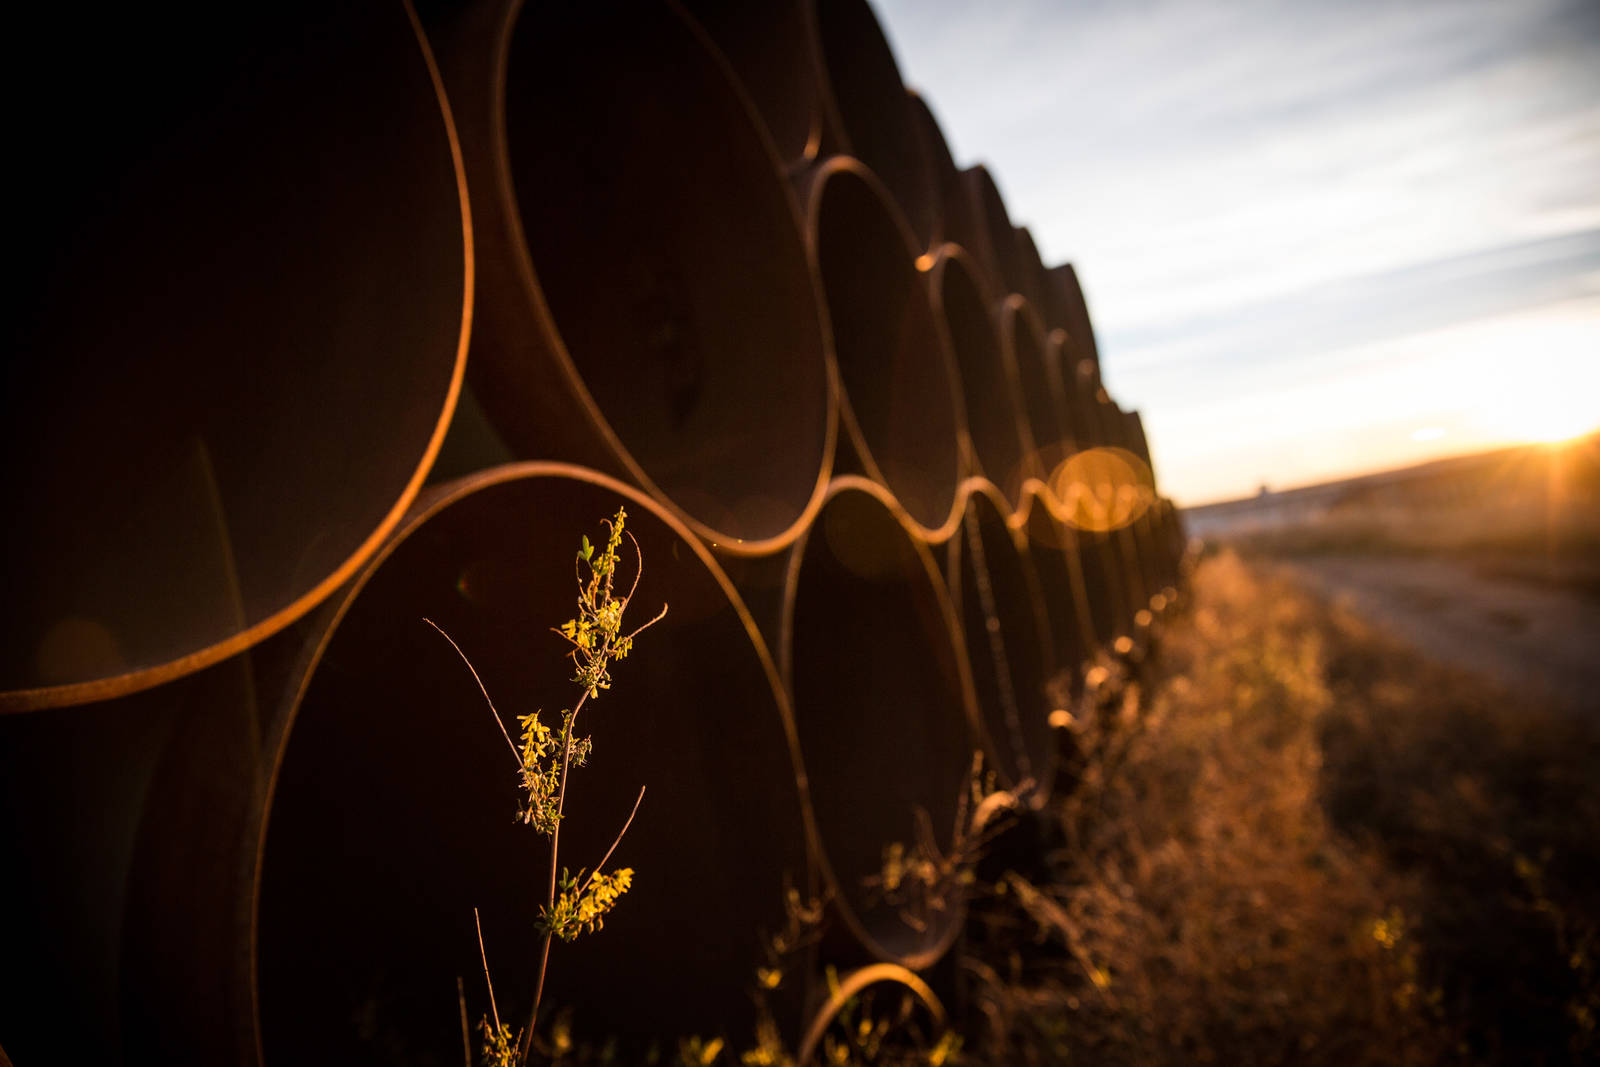 Embattled Atlantic Coast Pipeline Faces Environmental Justice Complaint